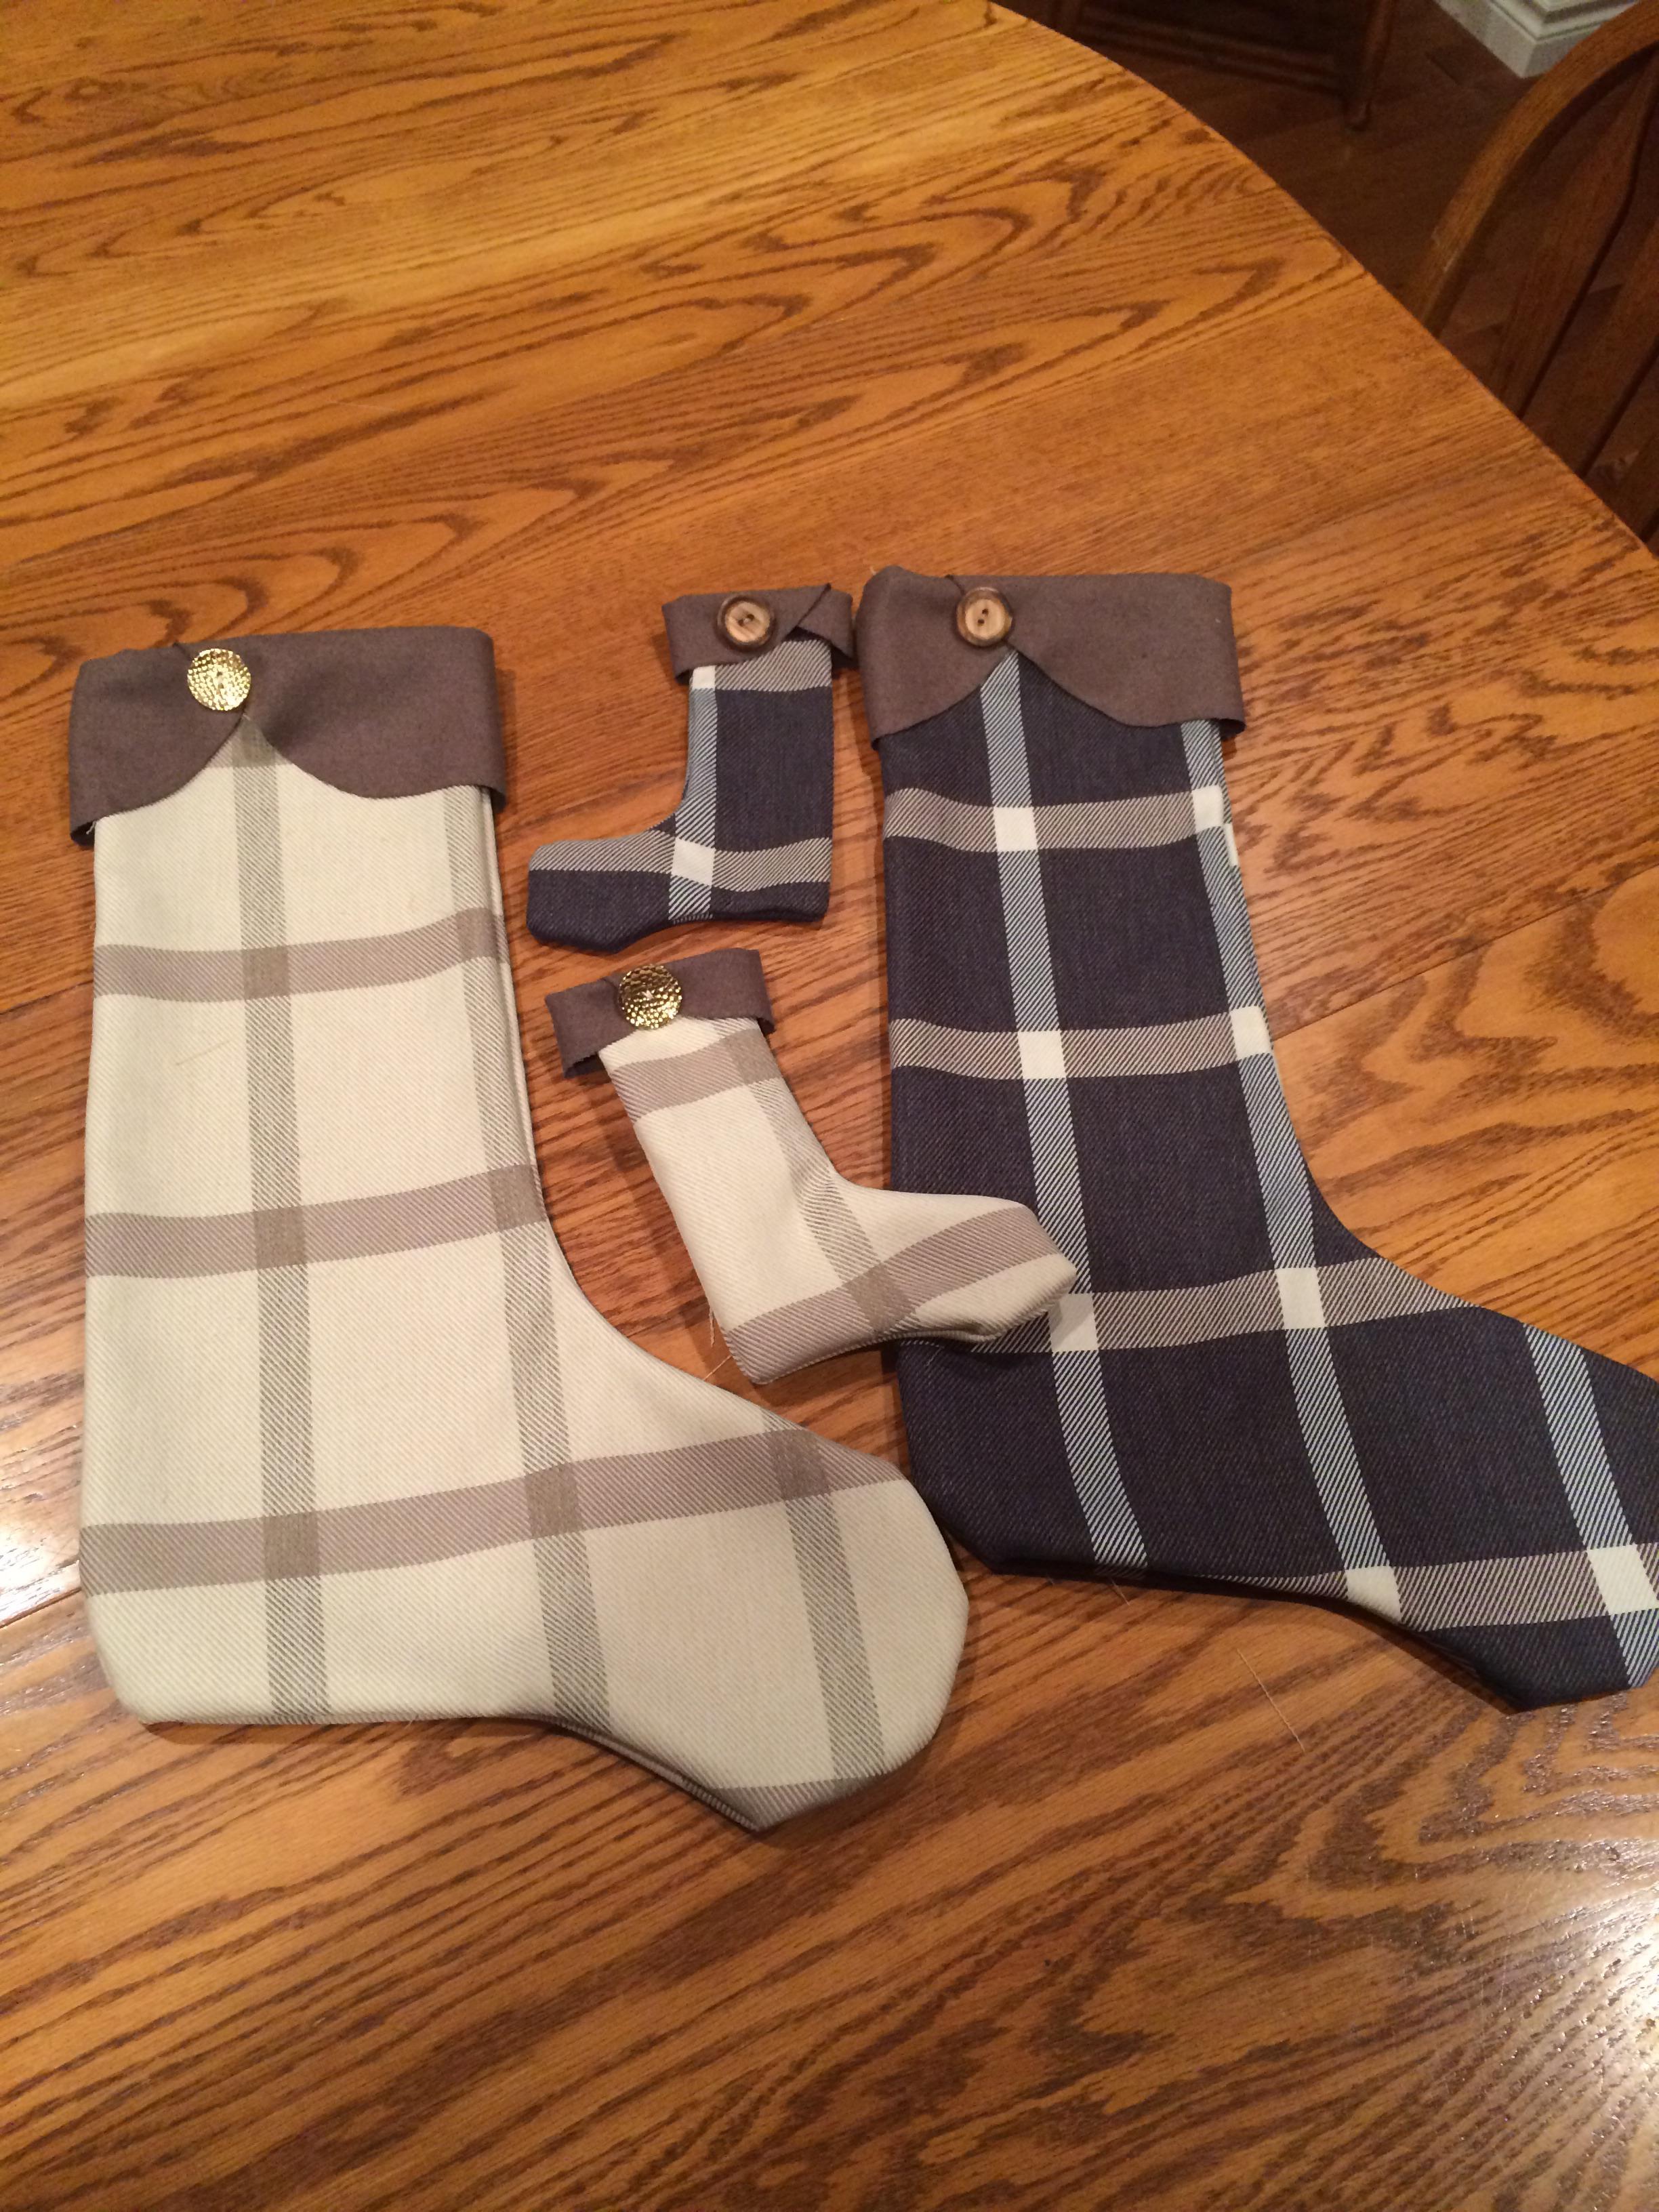 DIY Custom Holiday Stockings